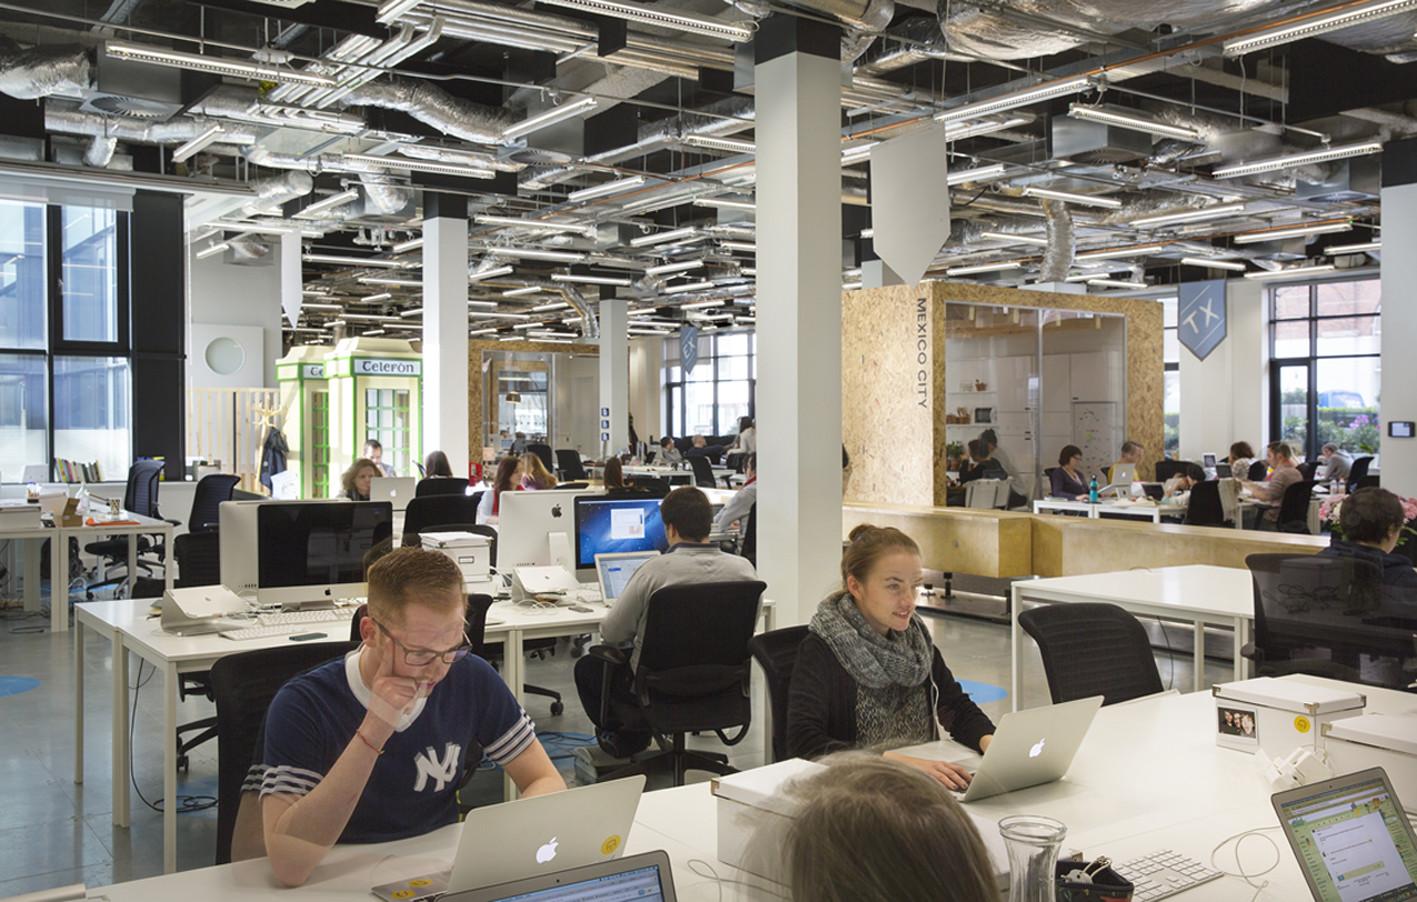 Airbnb's European Operations Hub in Dublin / Heneghan Peng ...